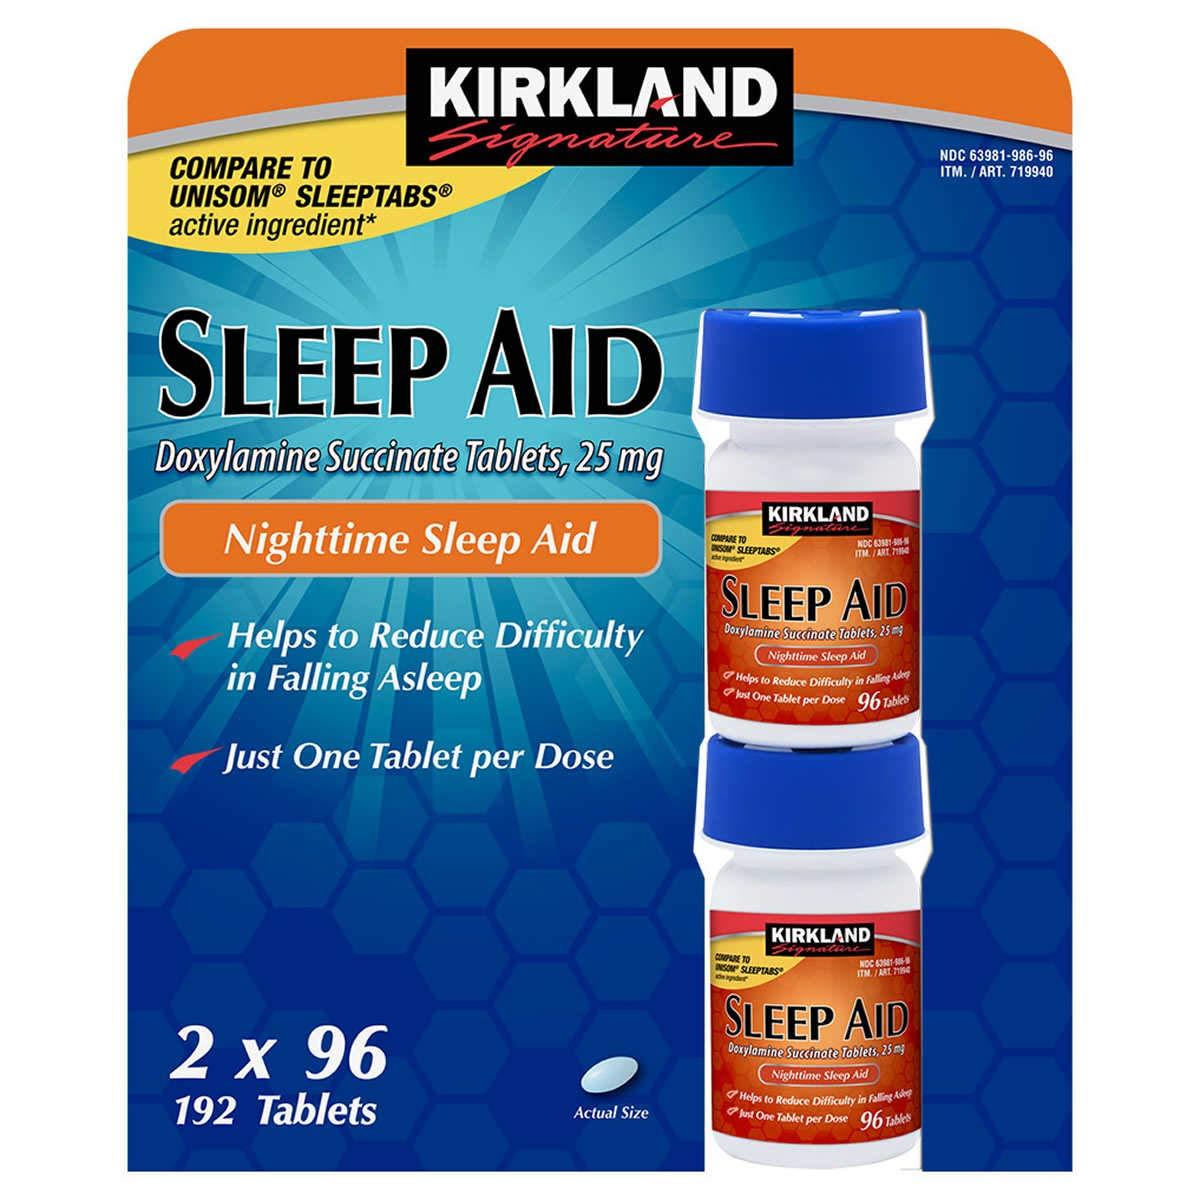 Kirkland Signature Sleep Aid Doxylamine Succinate 25 Mg, 192-Count (Pack of 3)